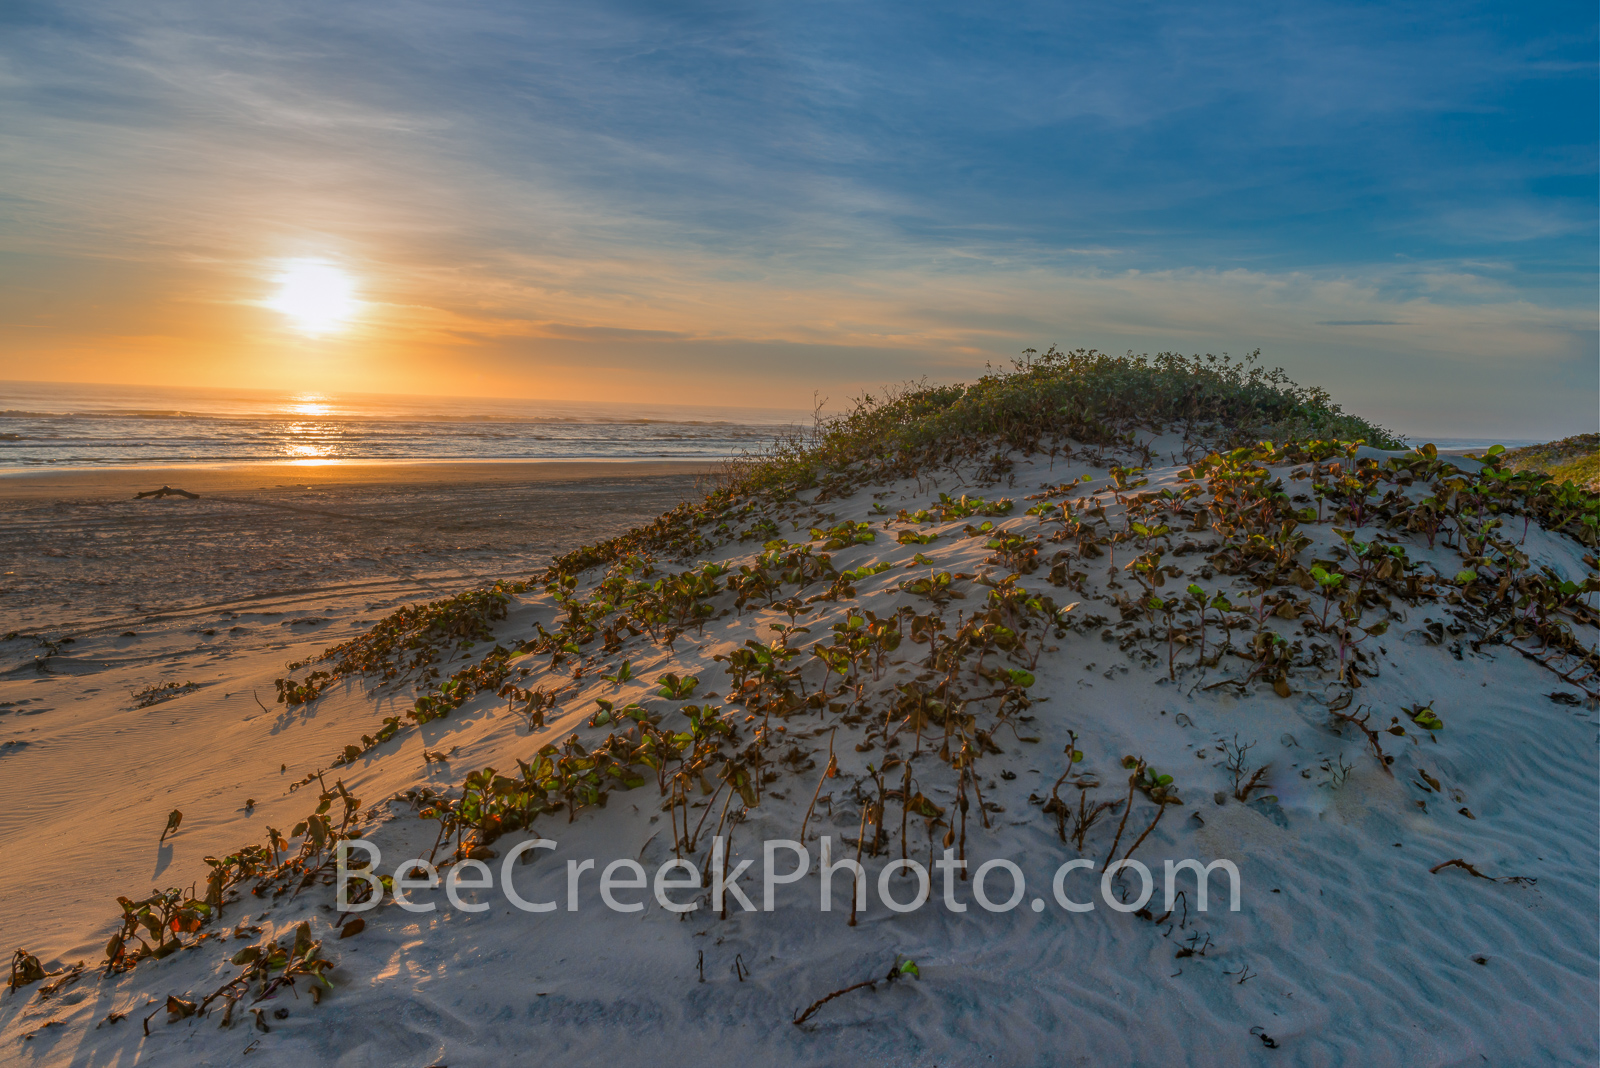 South Padre Island, beach, padre island, sand dune, south padre, sunrise, sunset, gulf coast, Texas beaches, seascape, gulf of mexico, surf, beach scenery, , photo